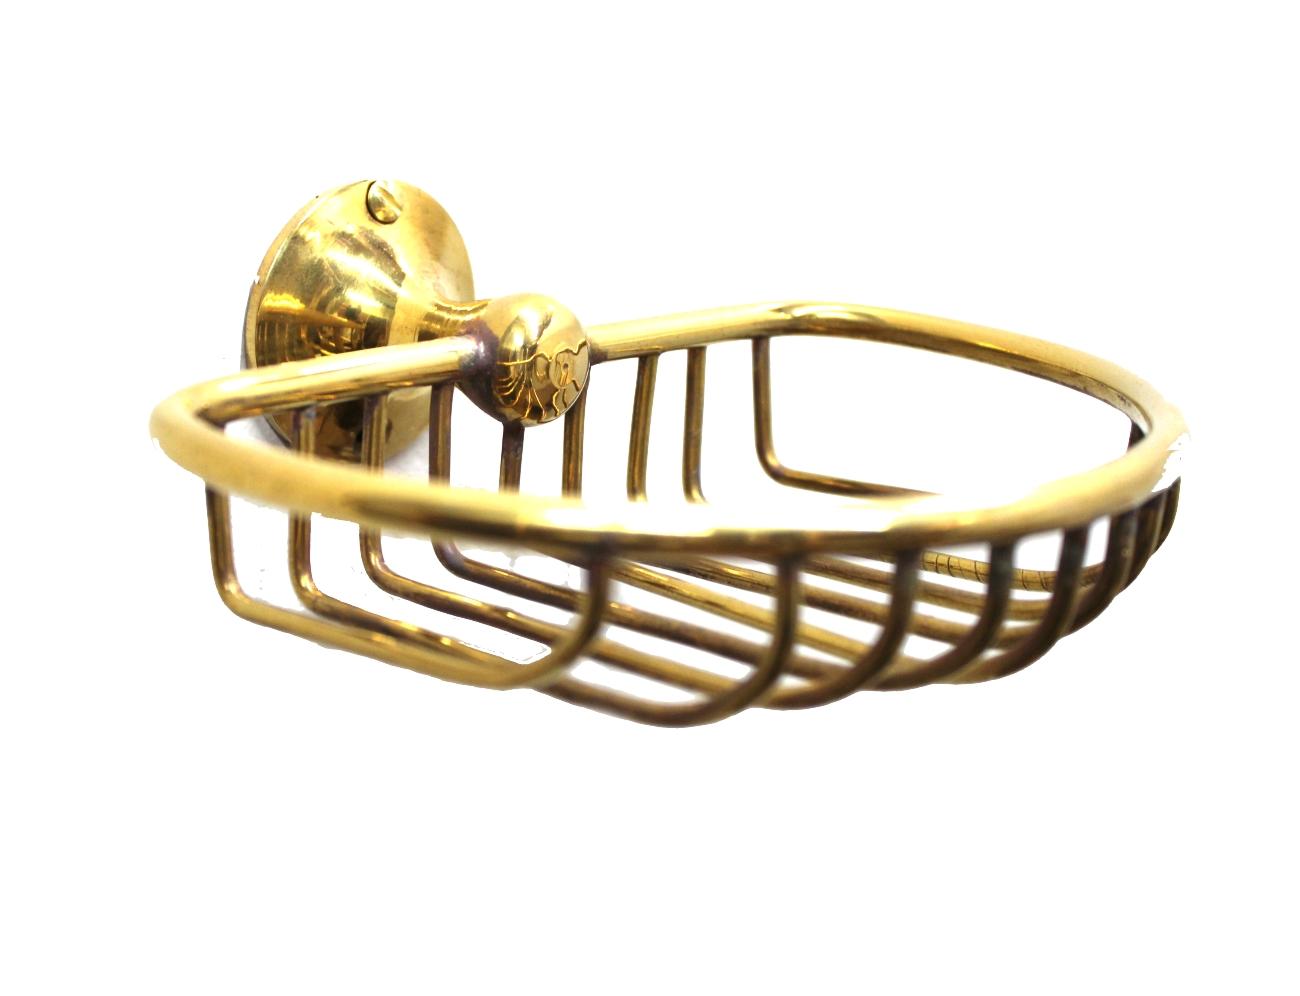 Wall Mount Soap Dish / Sponge wash cloth holder Solid Brass vintage Replica